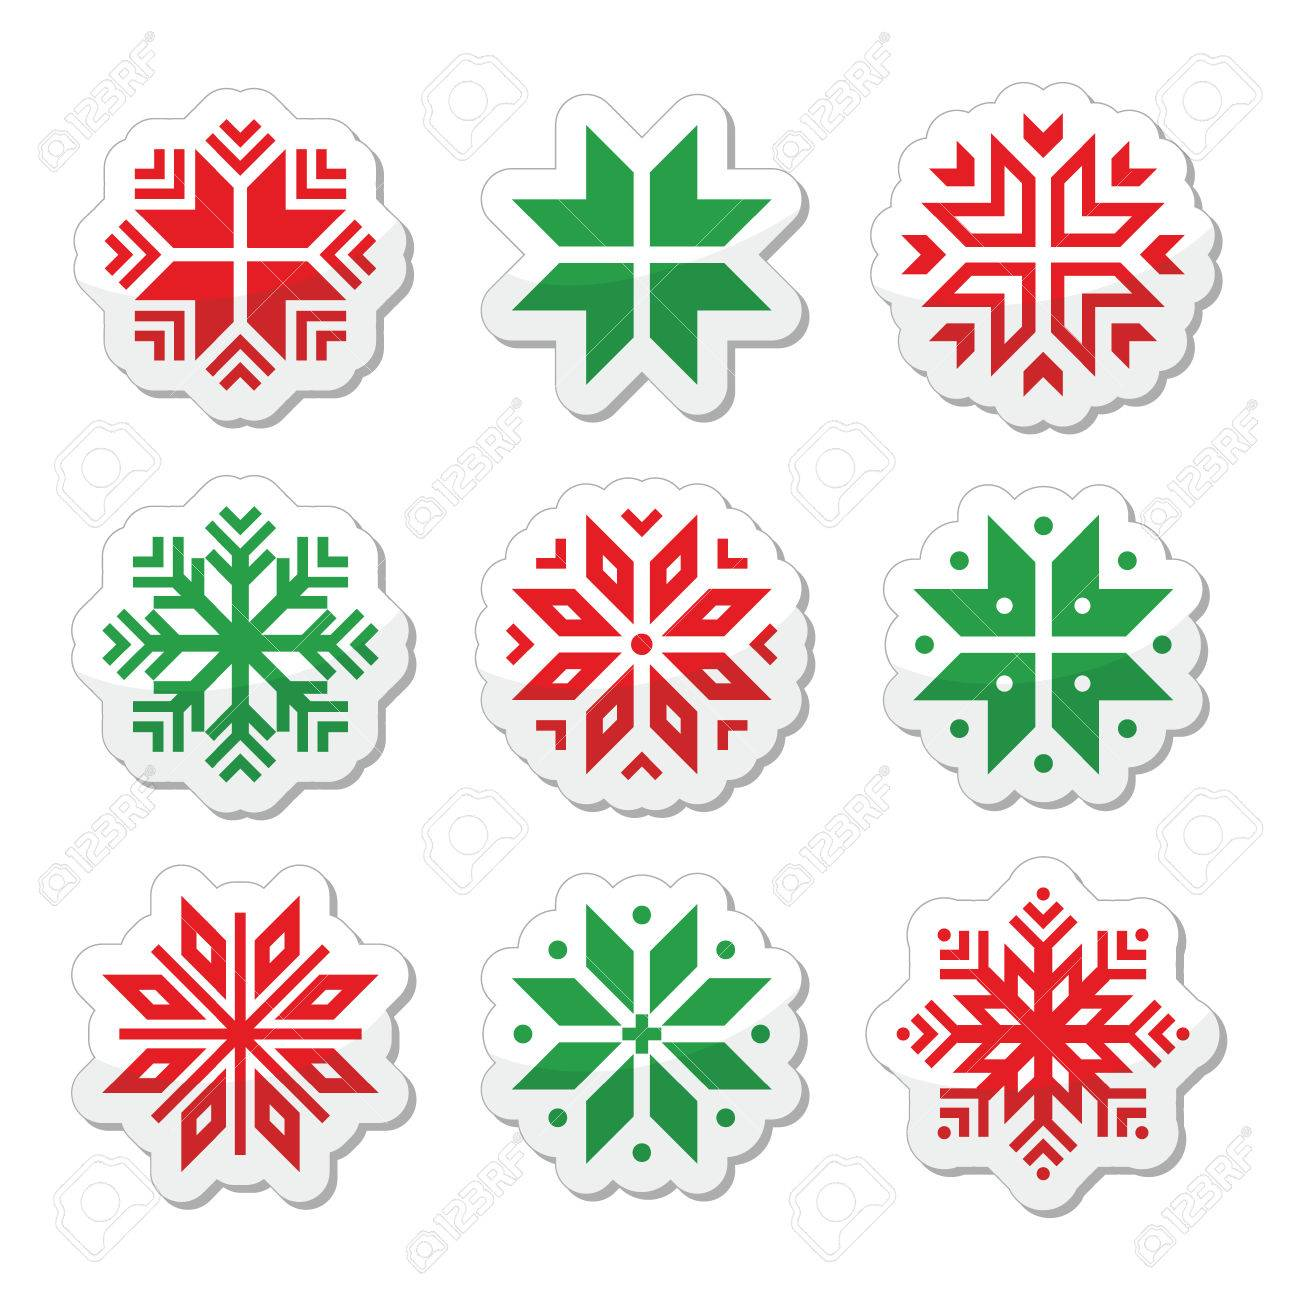 Christmas, winter snowflakes vector icons set Stock Vector - 24026031